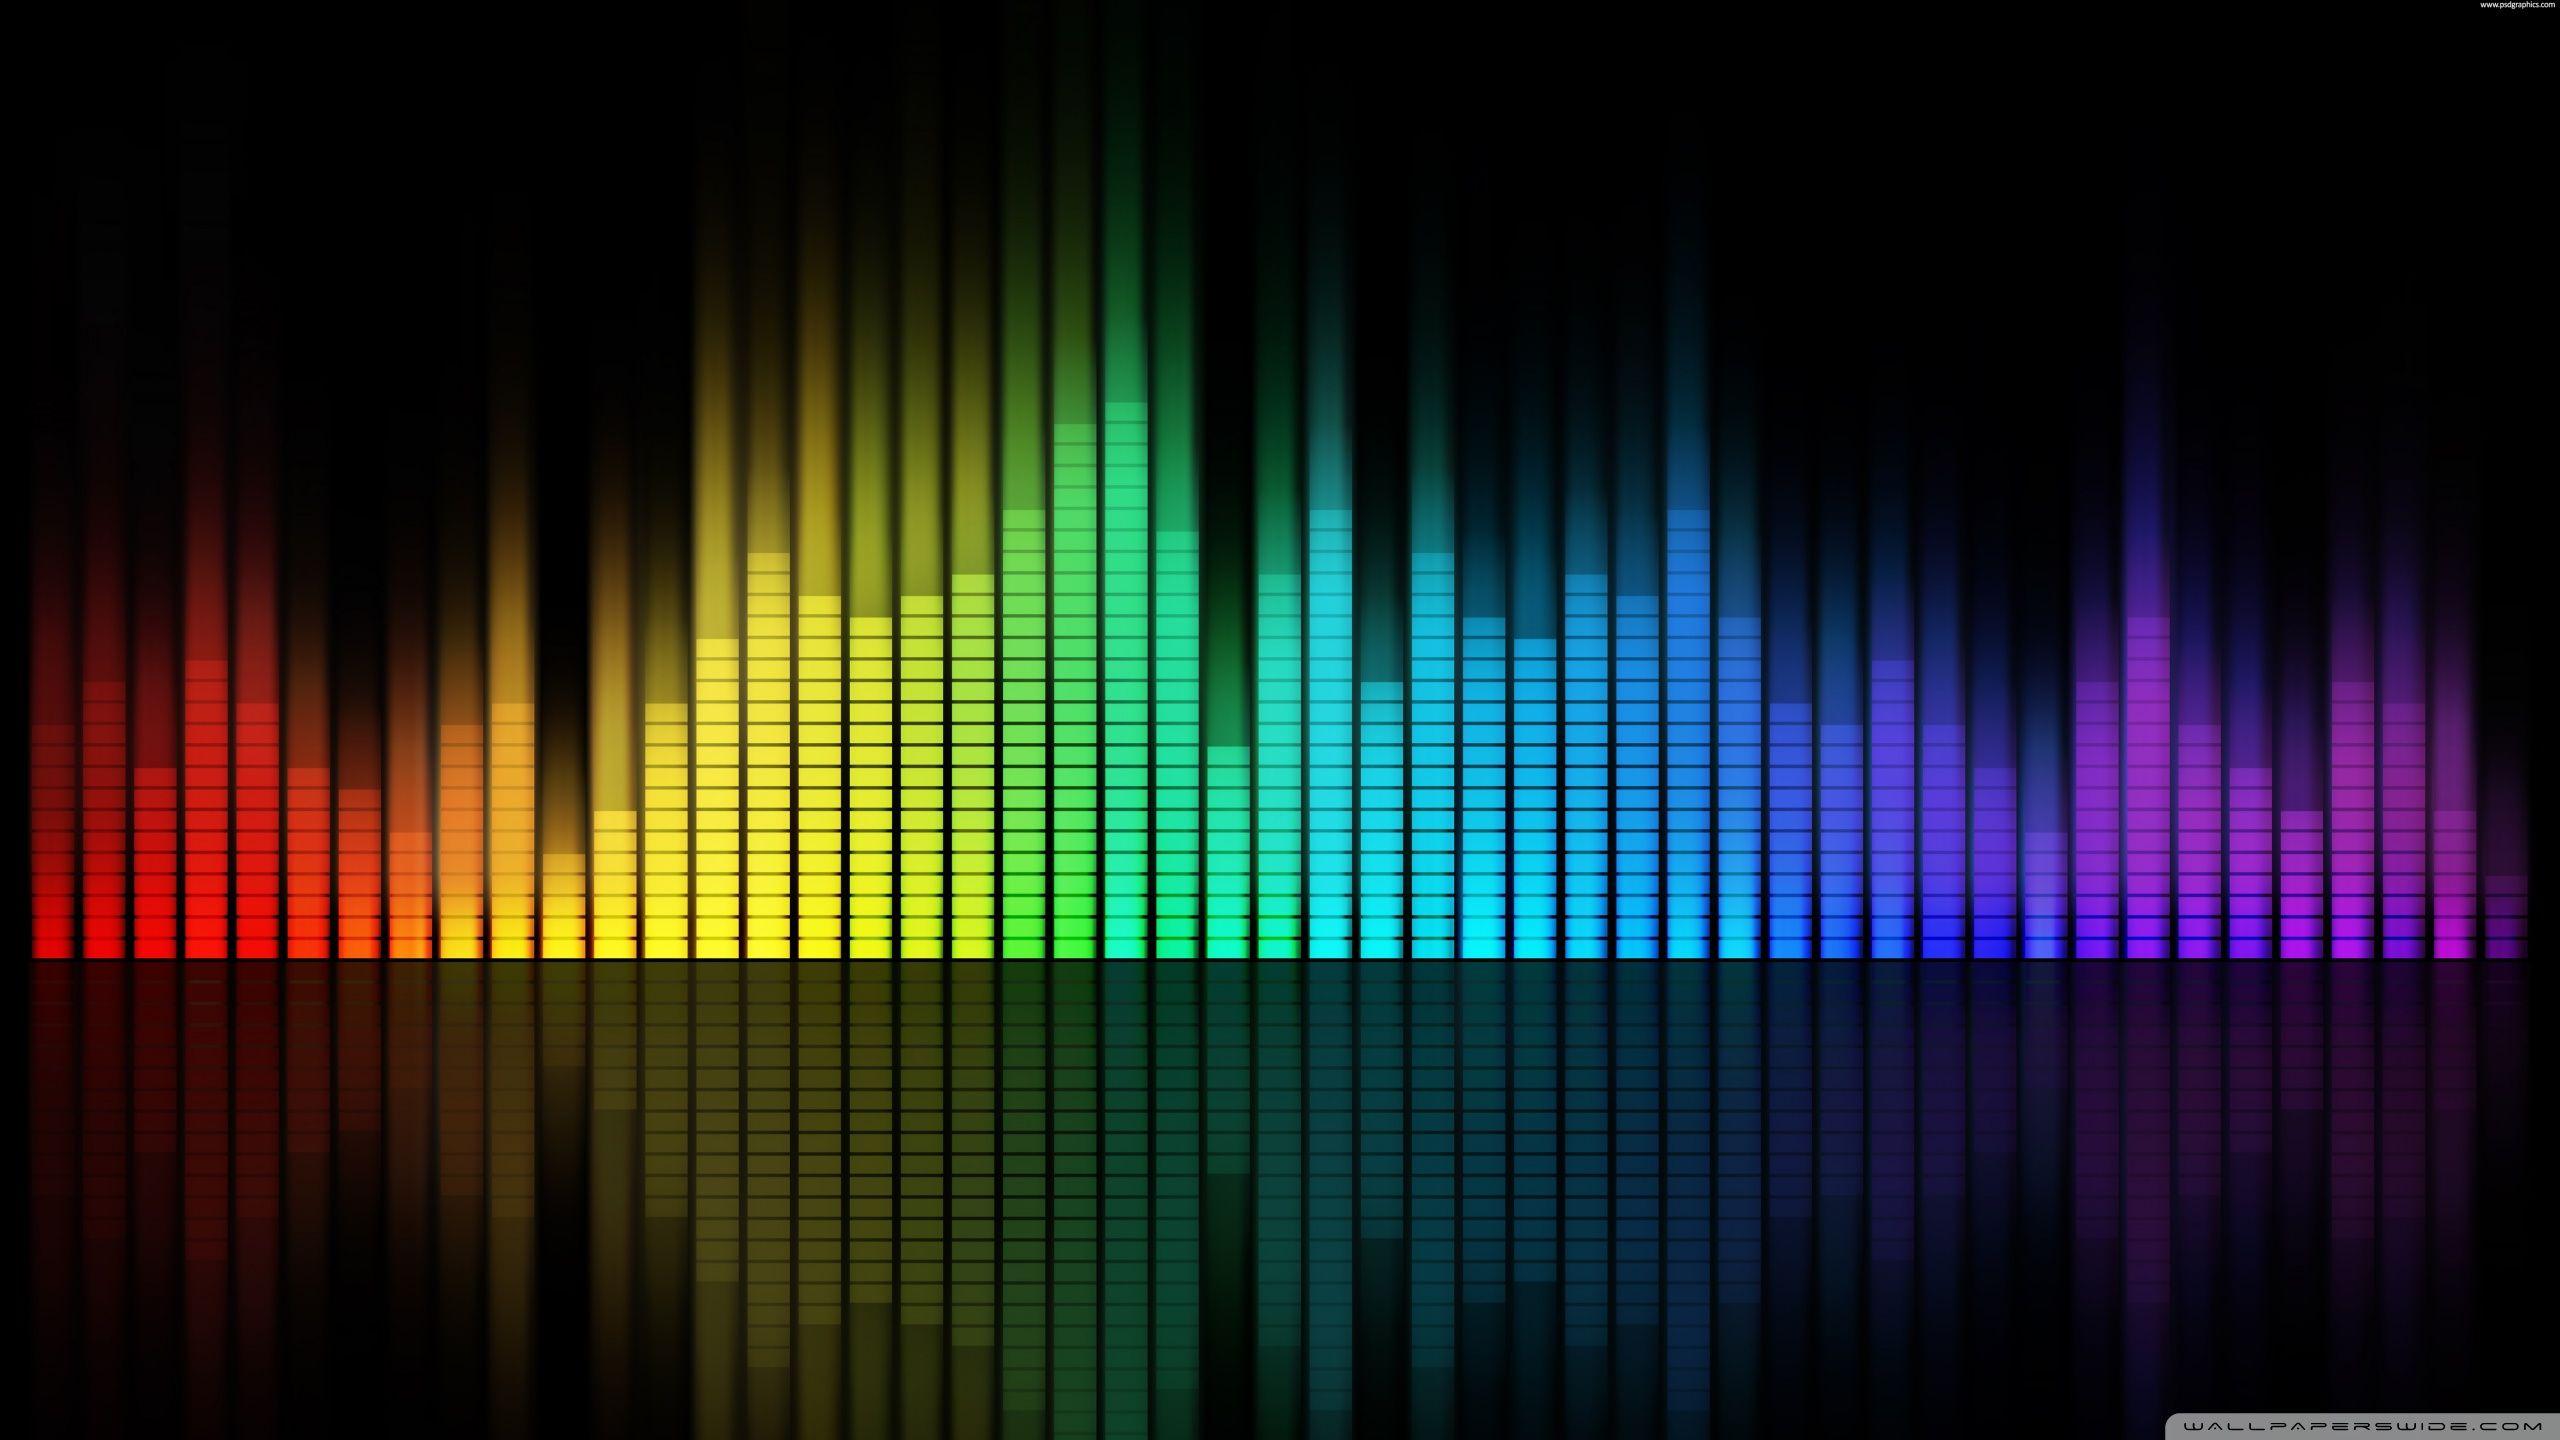 2560x1440 Music Google Search Karaoke Am Nhạc Am Thanh